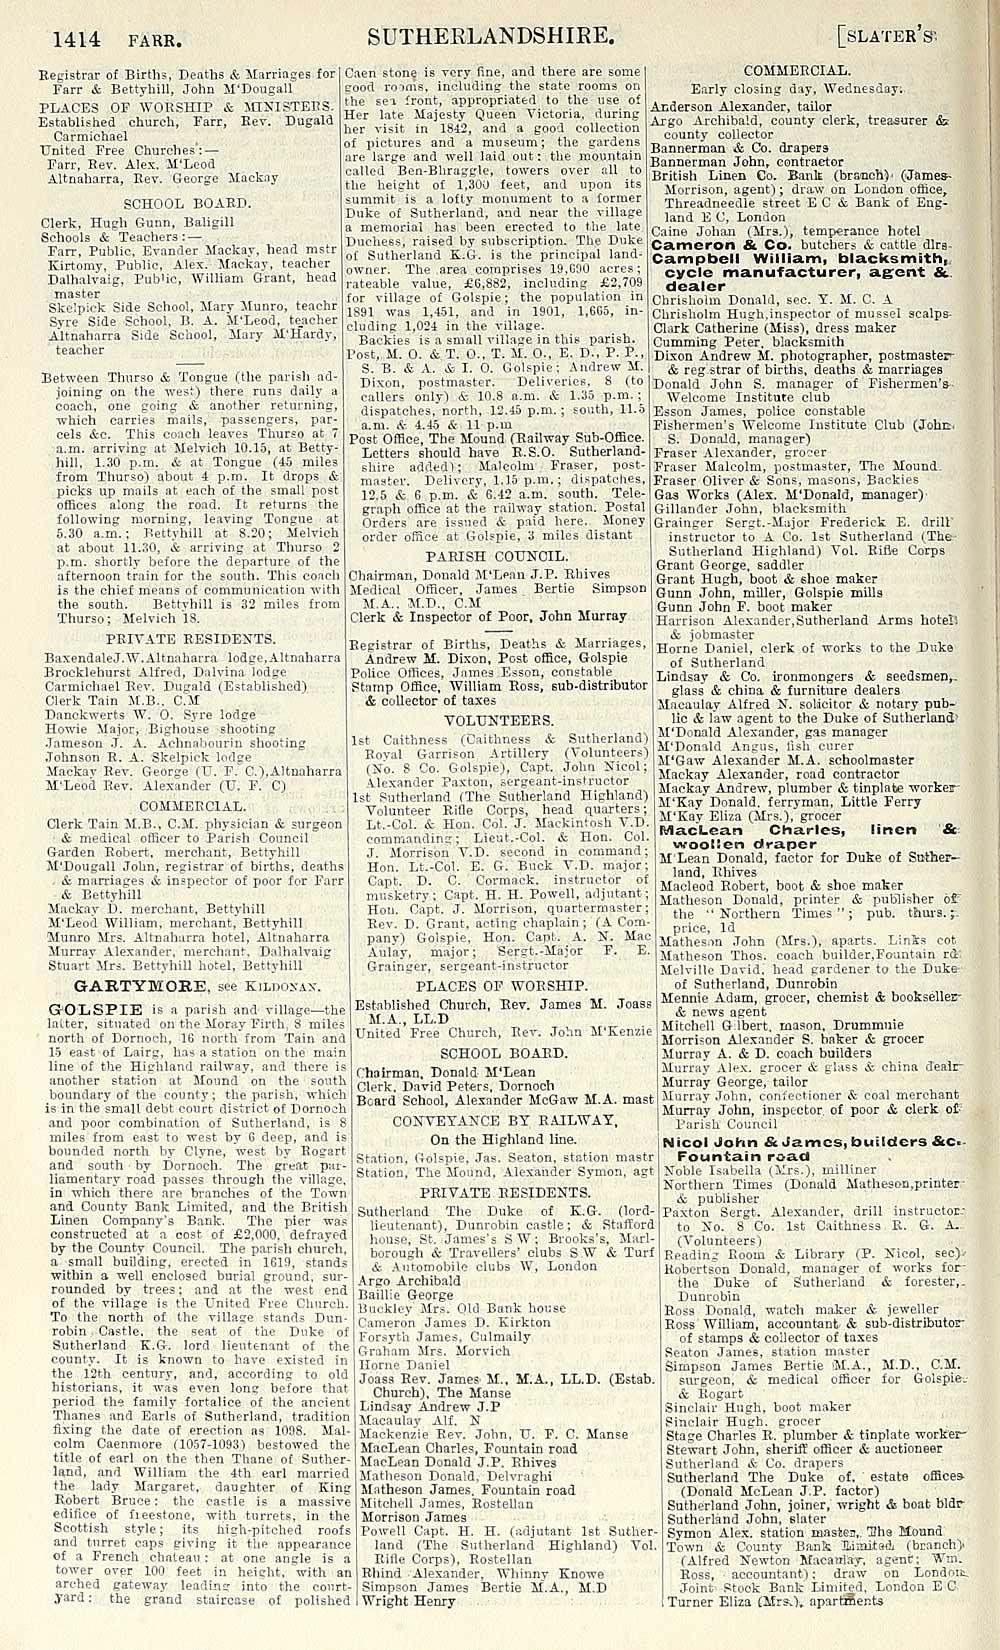 1478) - Scotland > 1882-1915 - Slater's Royal National